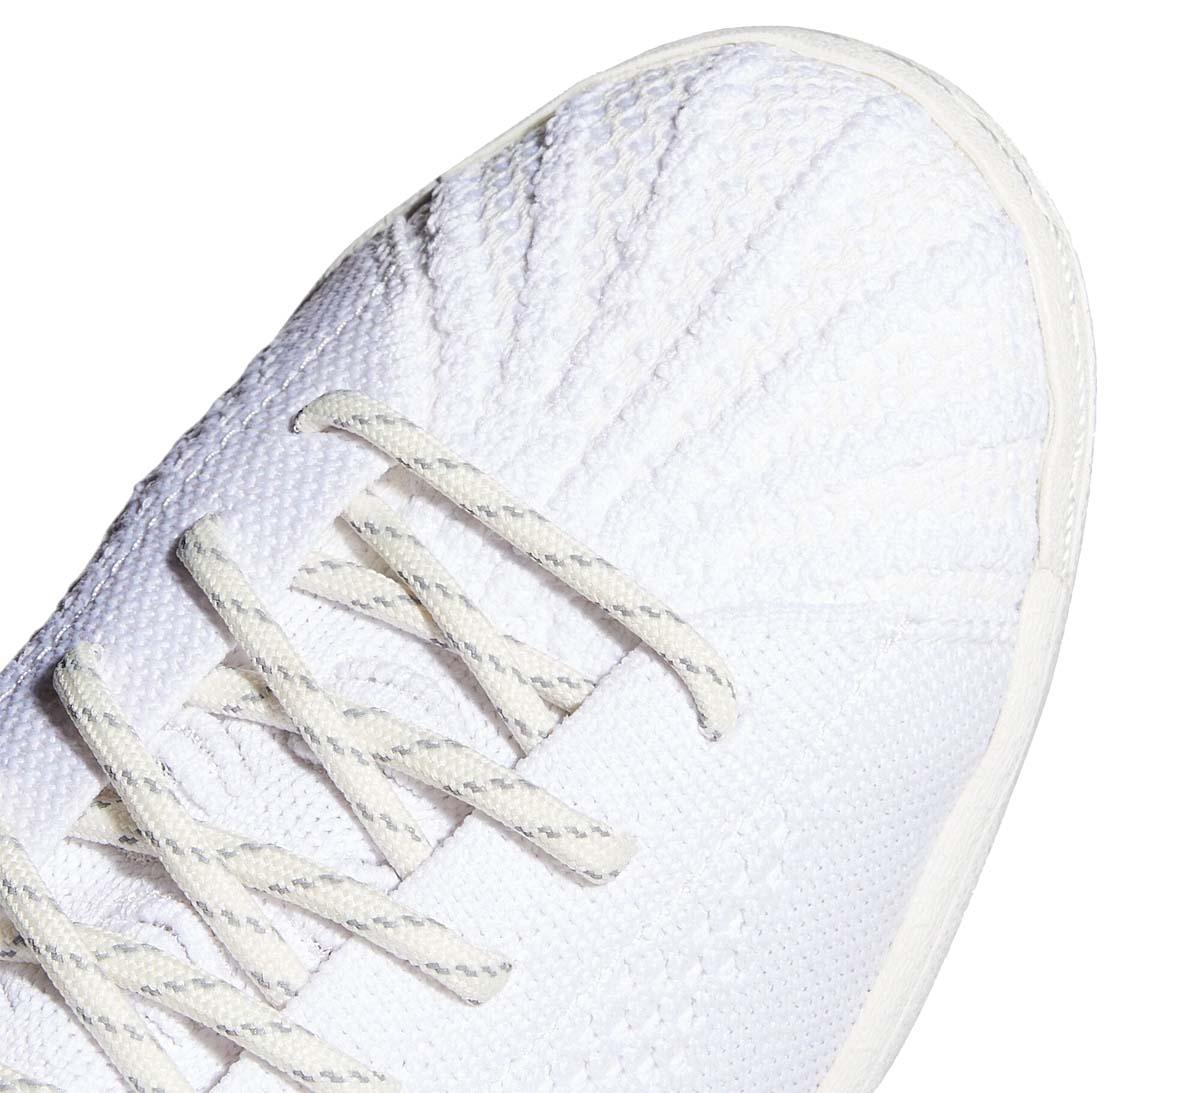 PHARRELL WILLIAMS × adidas SUPERSTAR PRIMEKNIT CORE WHITE / CORE WHITE / VIVIT GREEN GX0194 ファレル ウィリアムス × アディダス スーパースター プライムニット ホワイト/グリーン